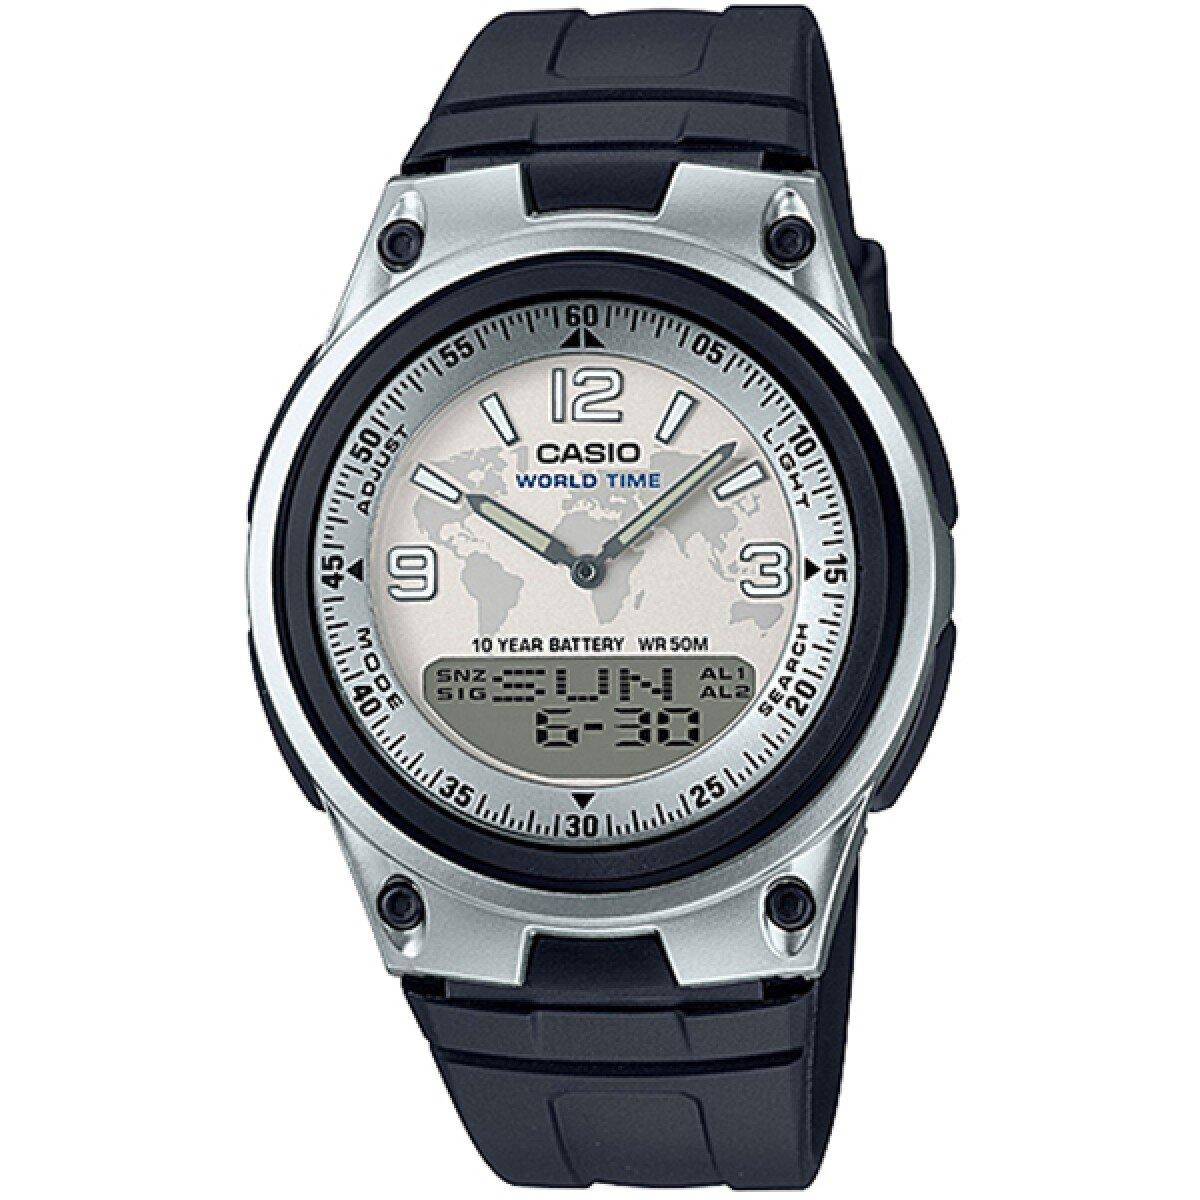 Đồng hồ nam Casio AW-80-7A2VDF - dây nhựa